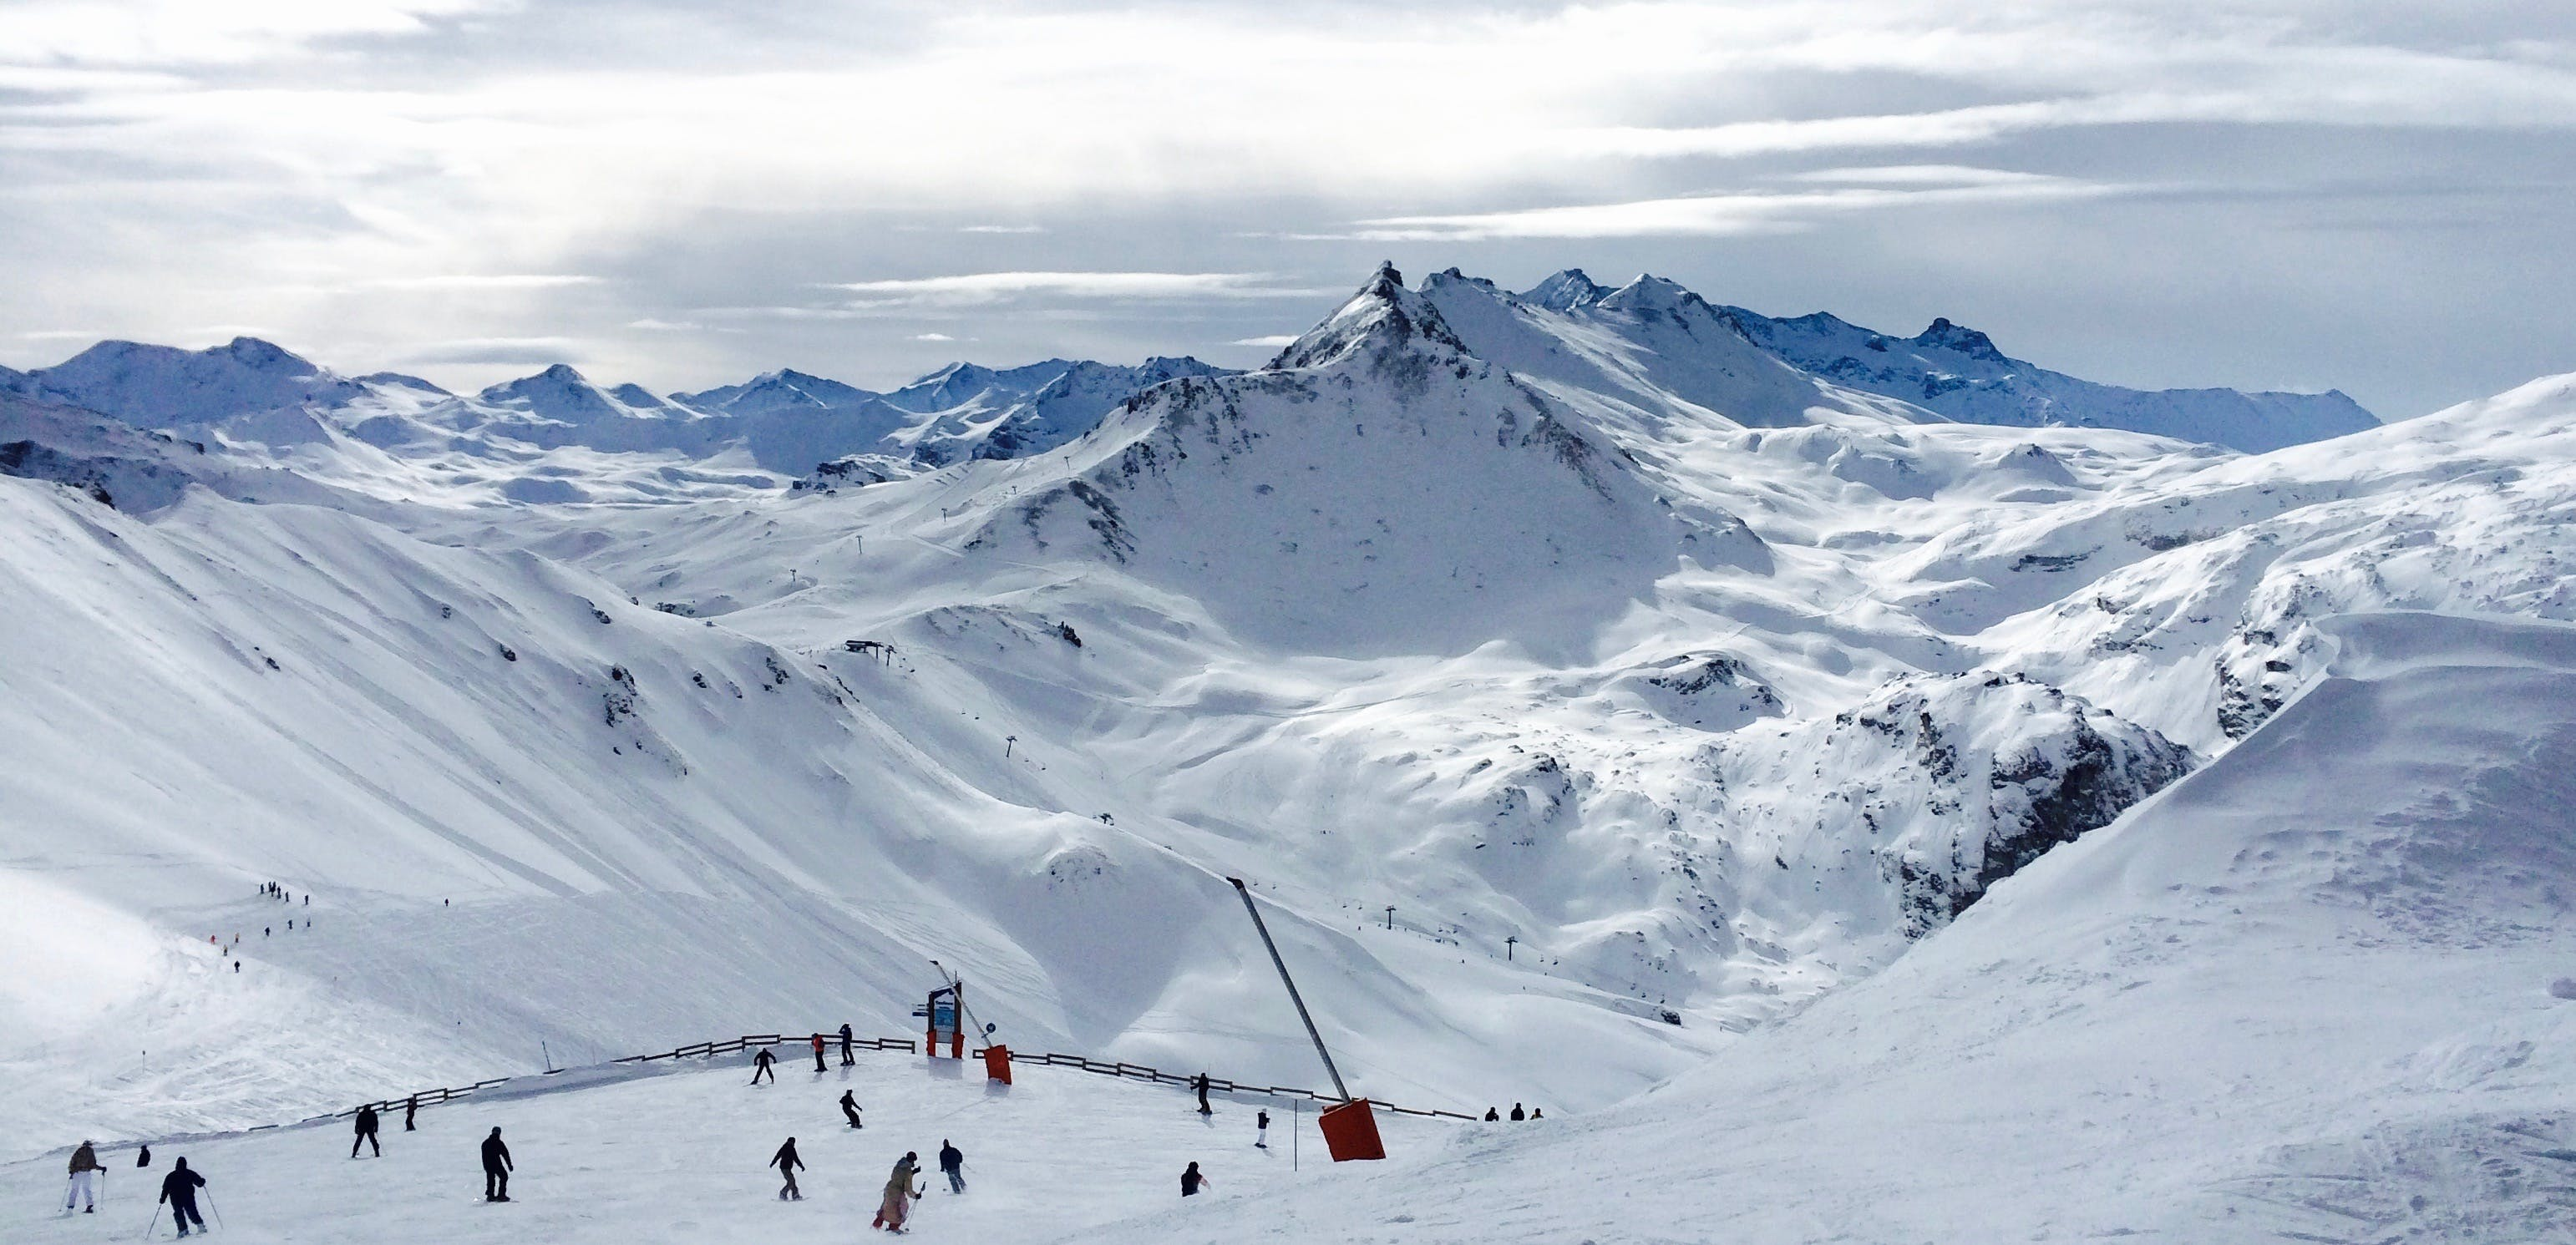 People Lurking Around on Snow Field Near Mountains